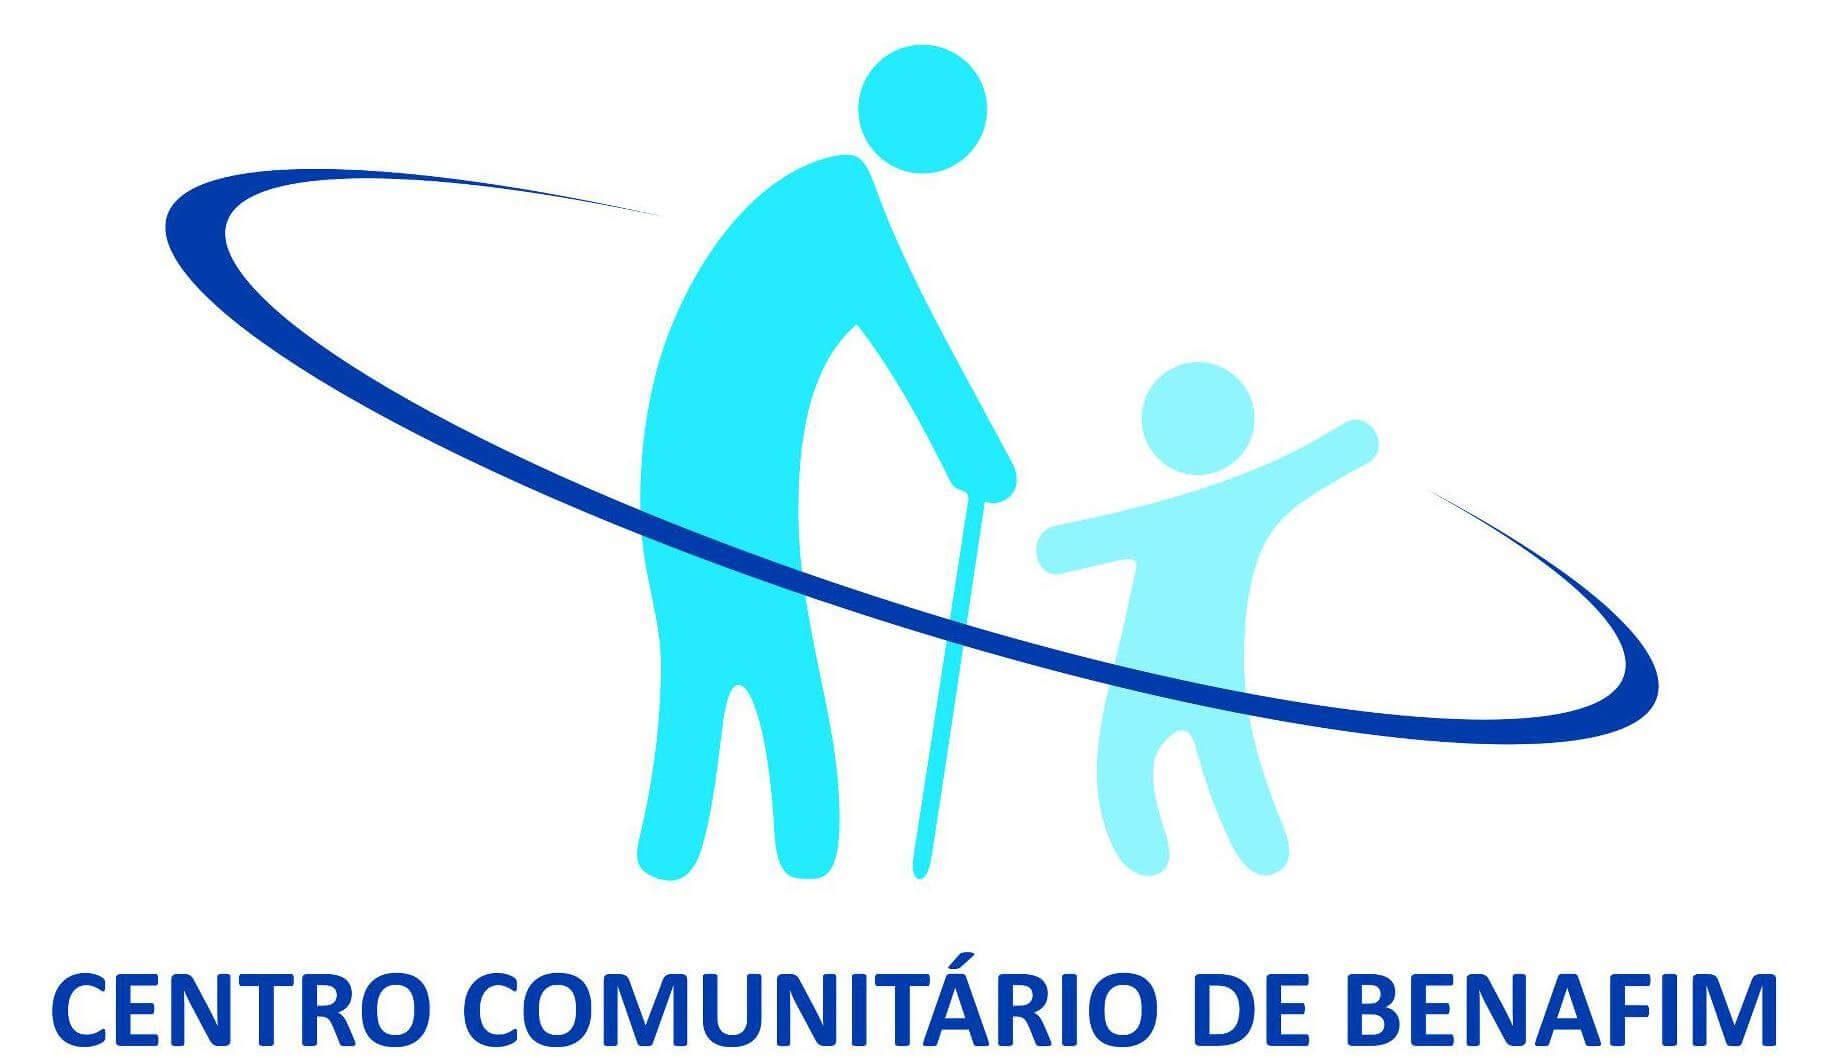 centro comunitario de benafim